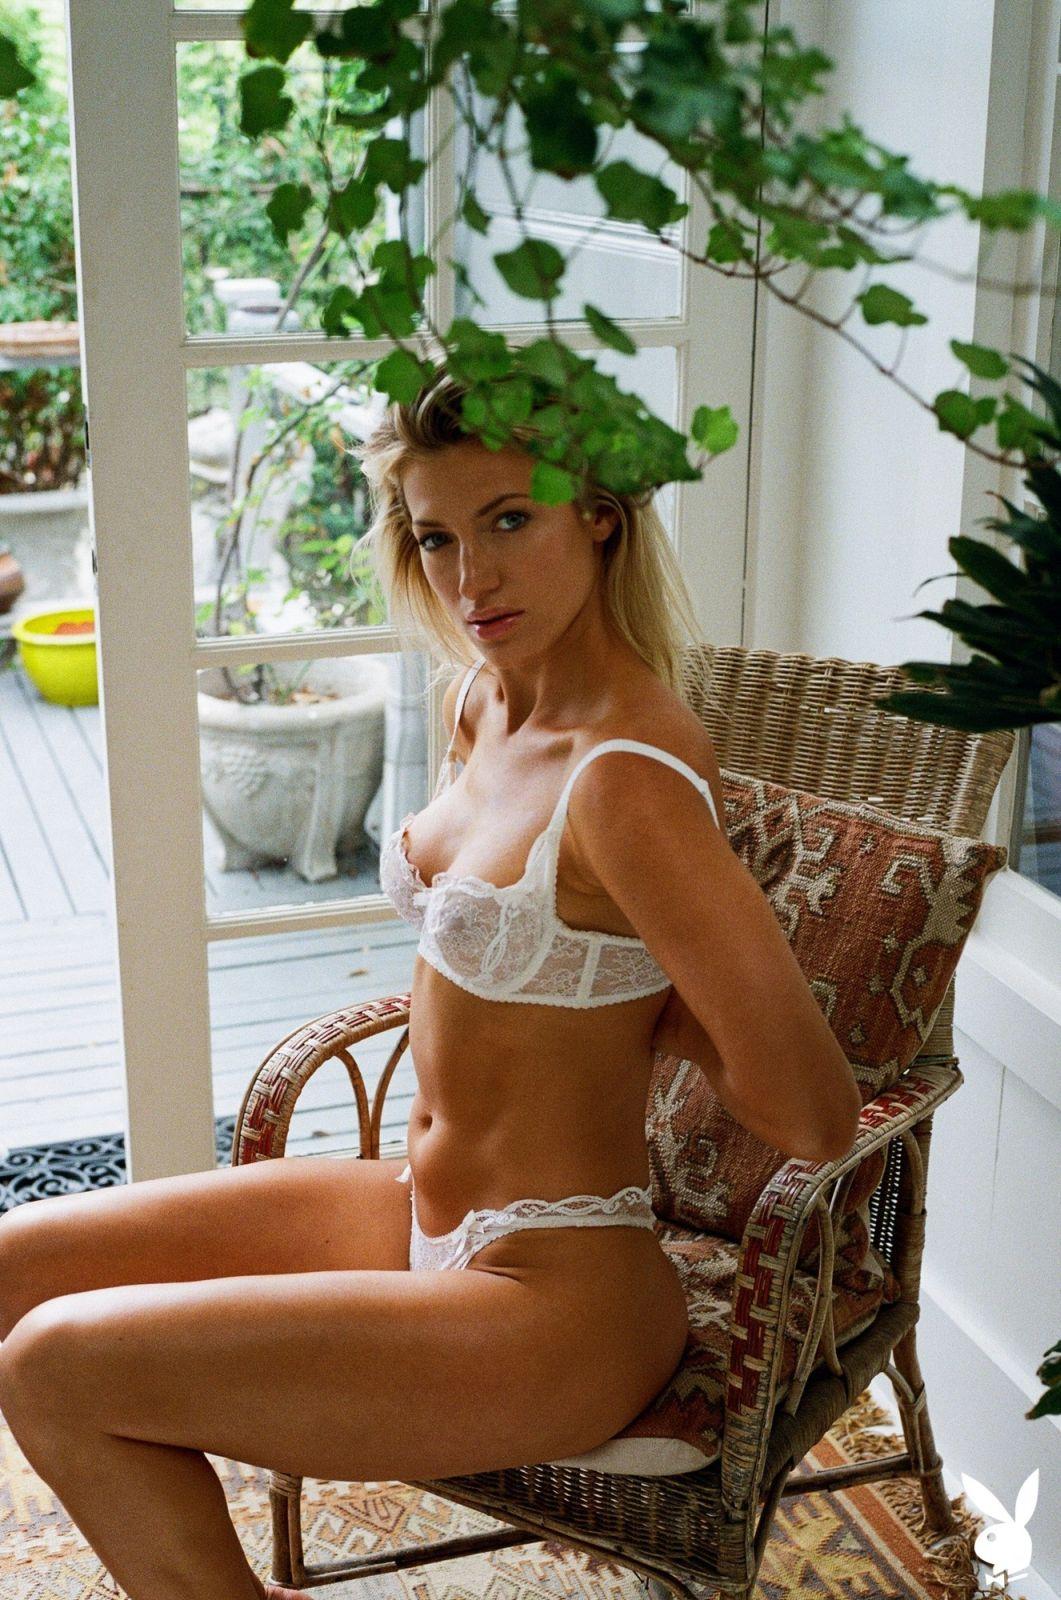 Jessica nackt LaRusso Jessica russo